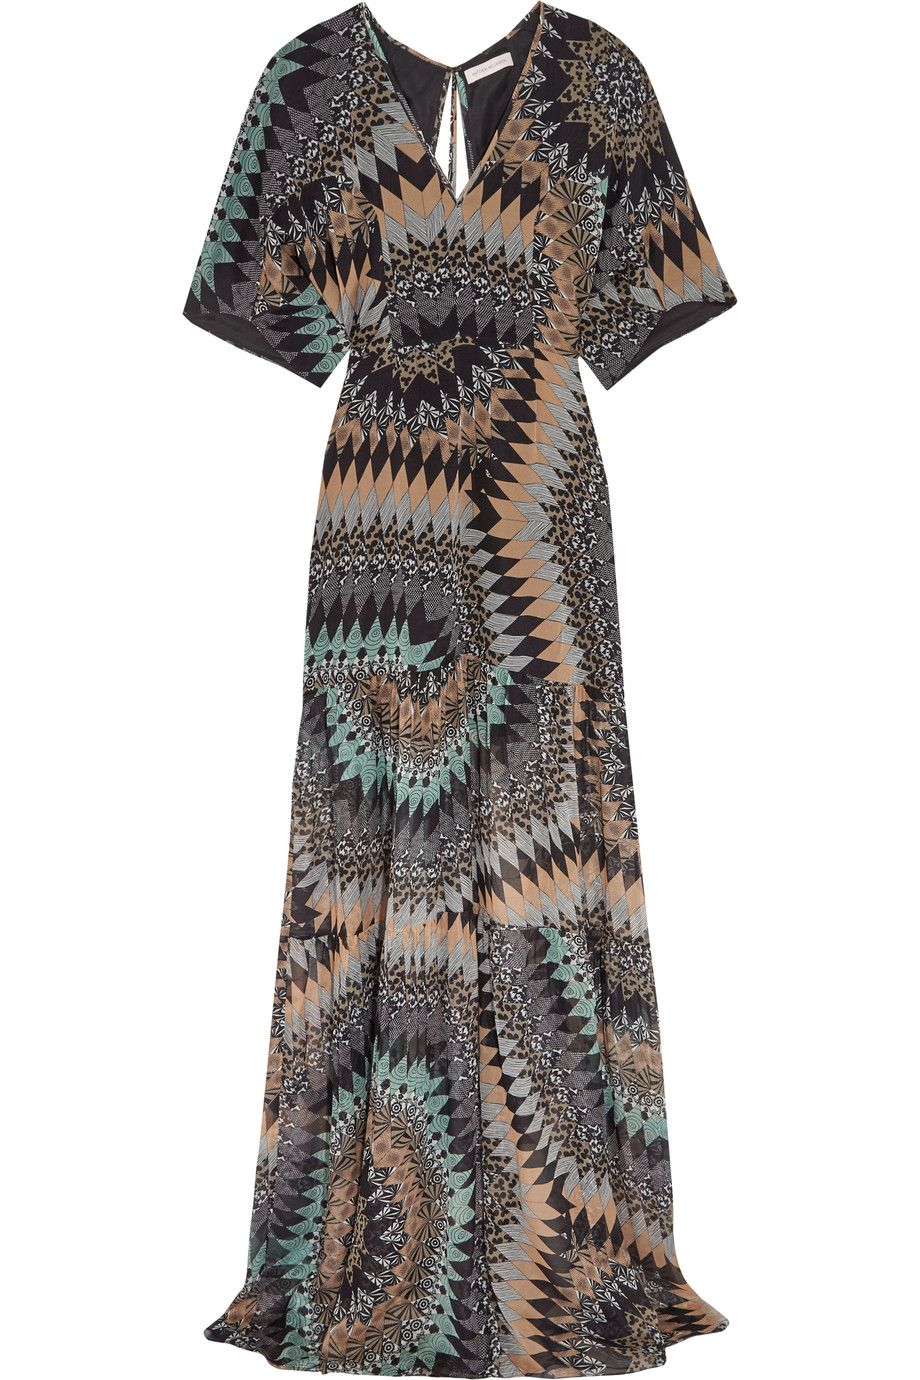 Designer maxi dress sale uk